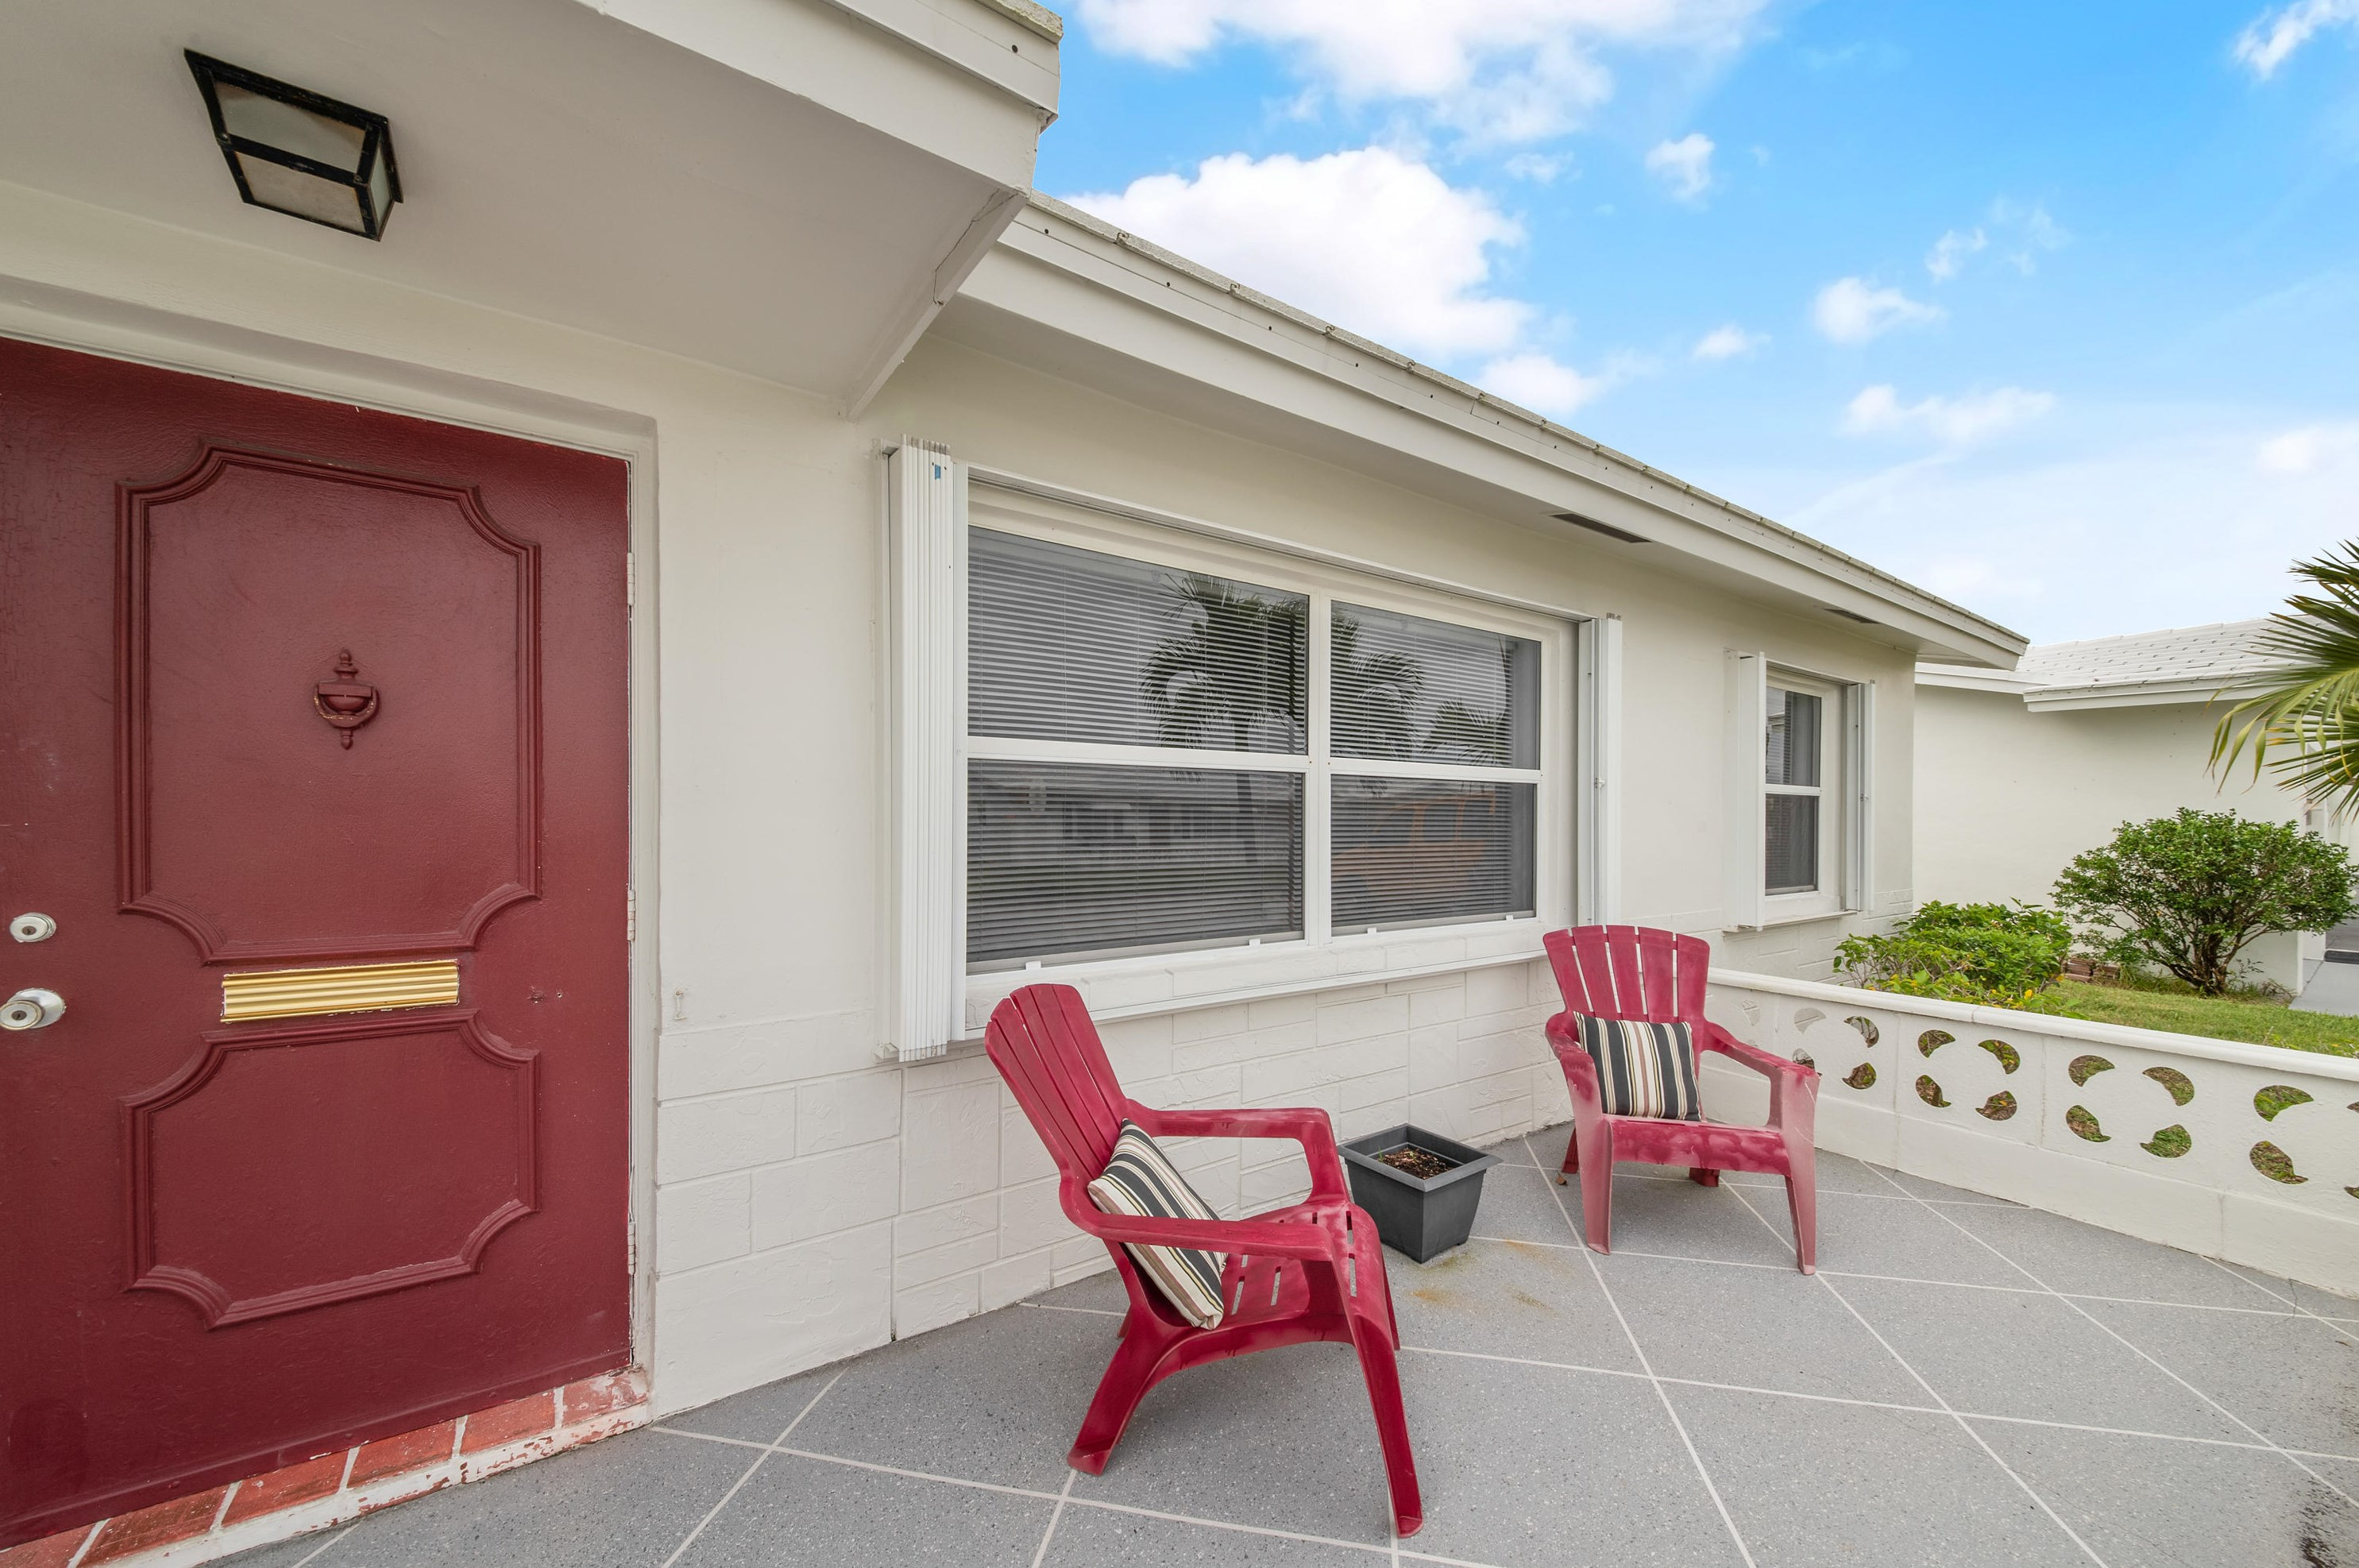 2390 Sw 13th Terrace, Boynton Beach, FL 33426